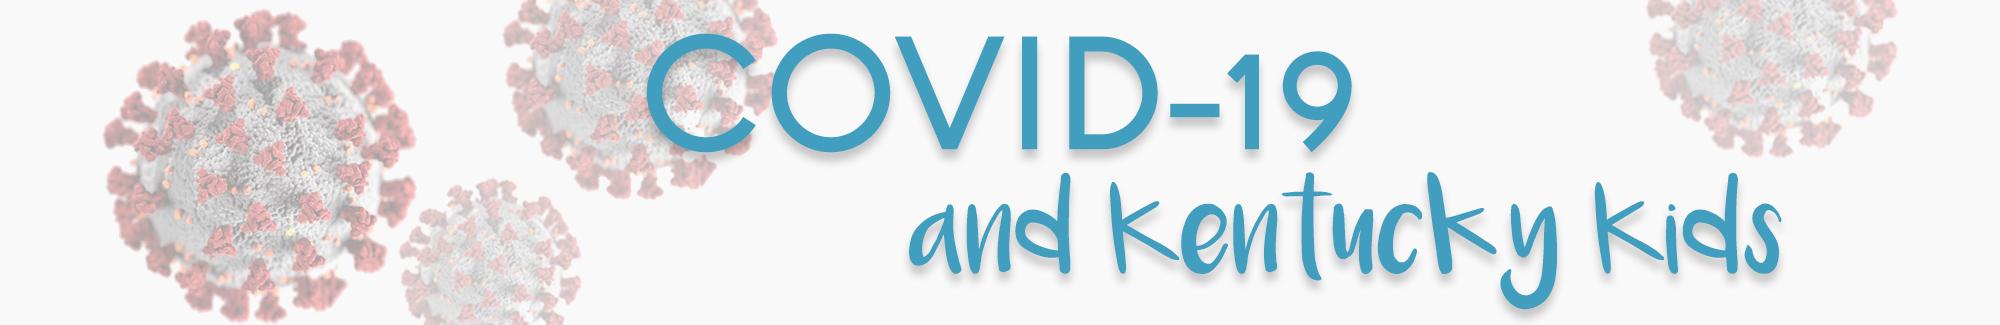 COVID-19 Header